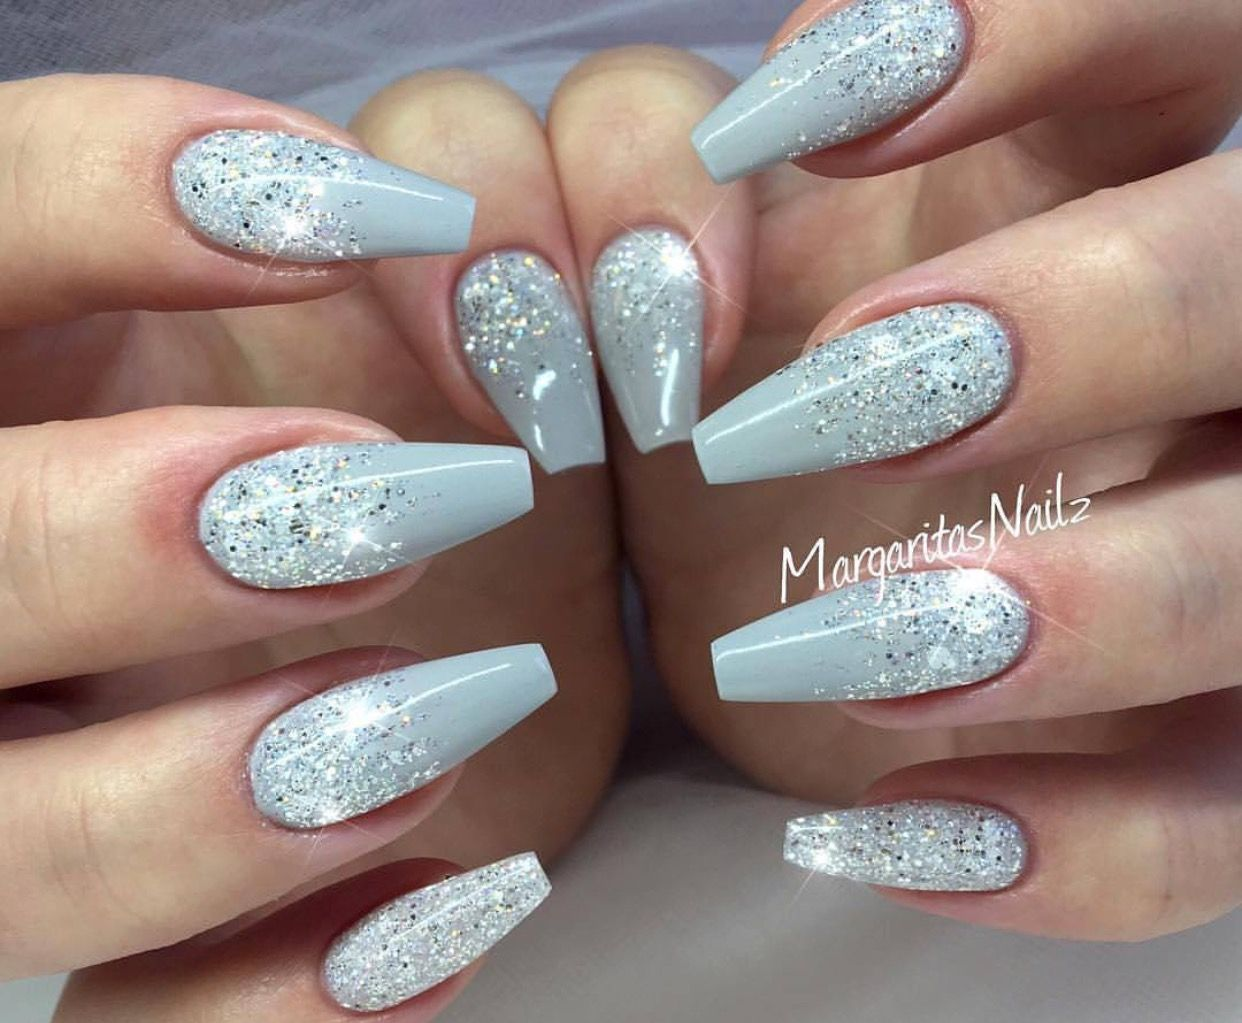 winter inspired nails ❄ winter nails - http://amzn.to/2idawtq